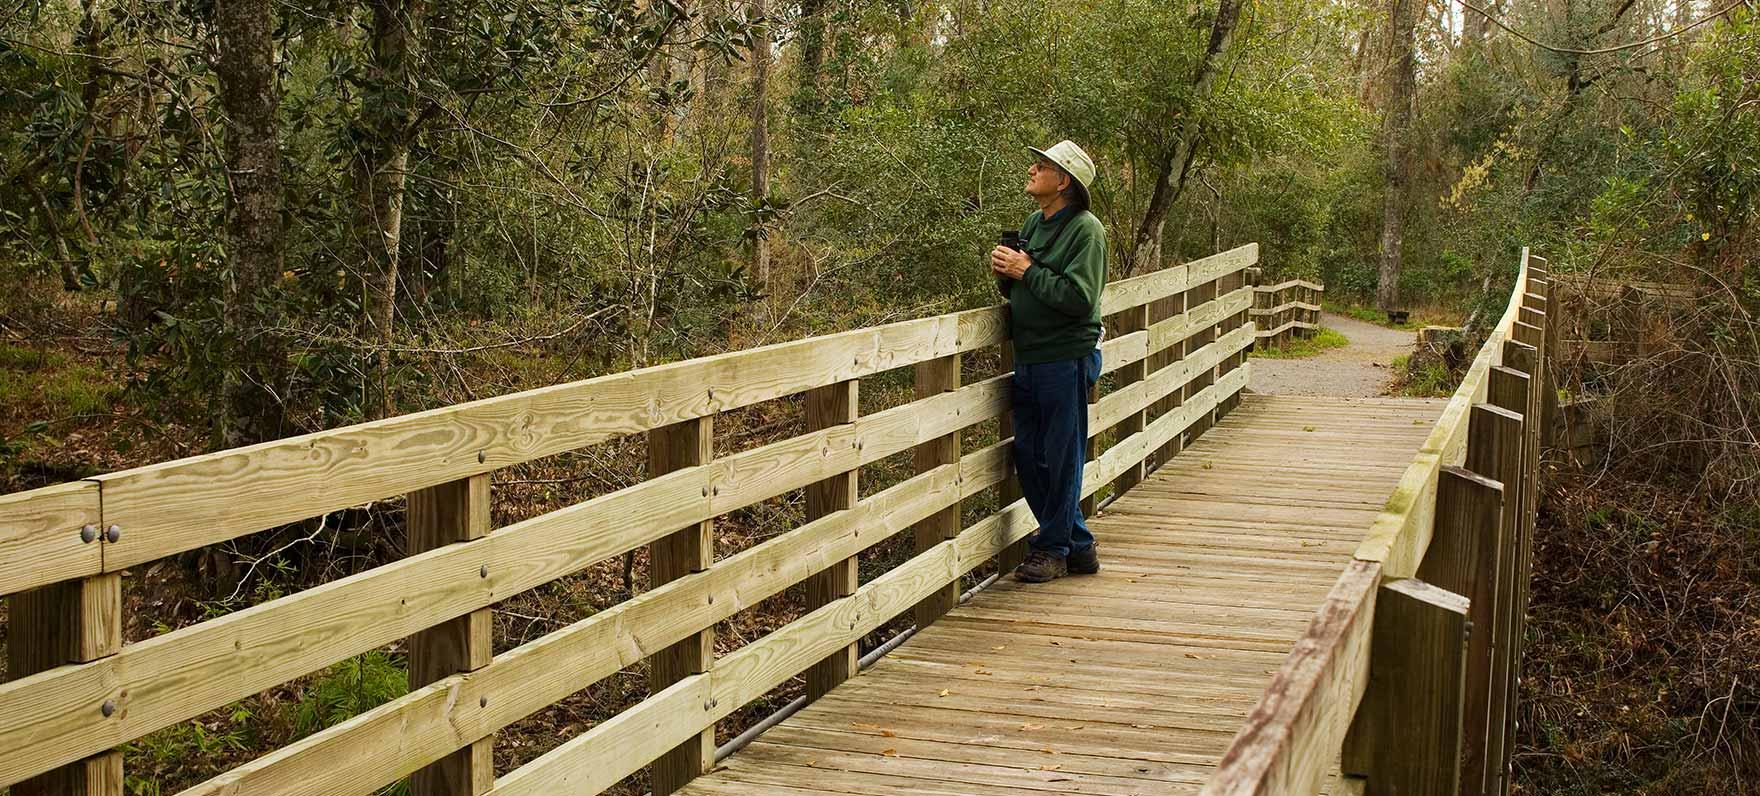 Village Creek State Park — Texas Parks & Wildlife Department